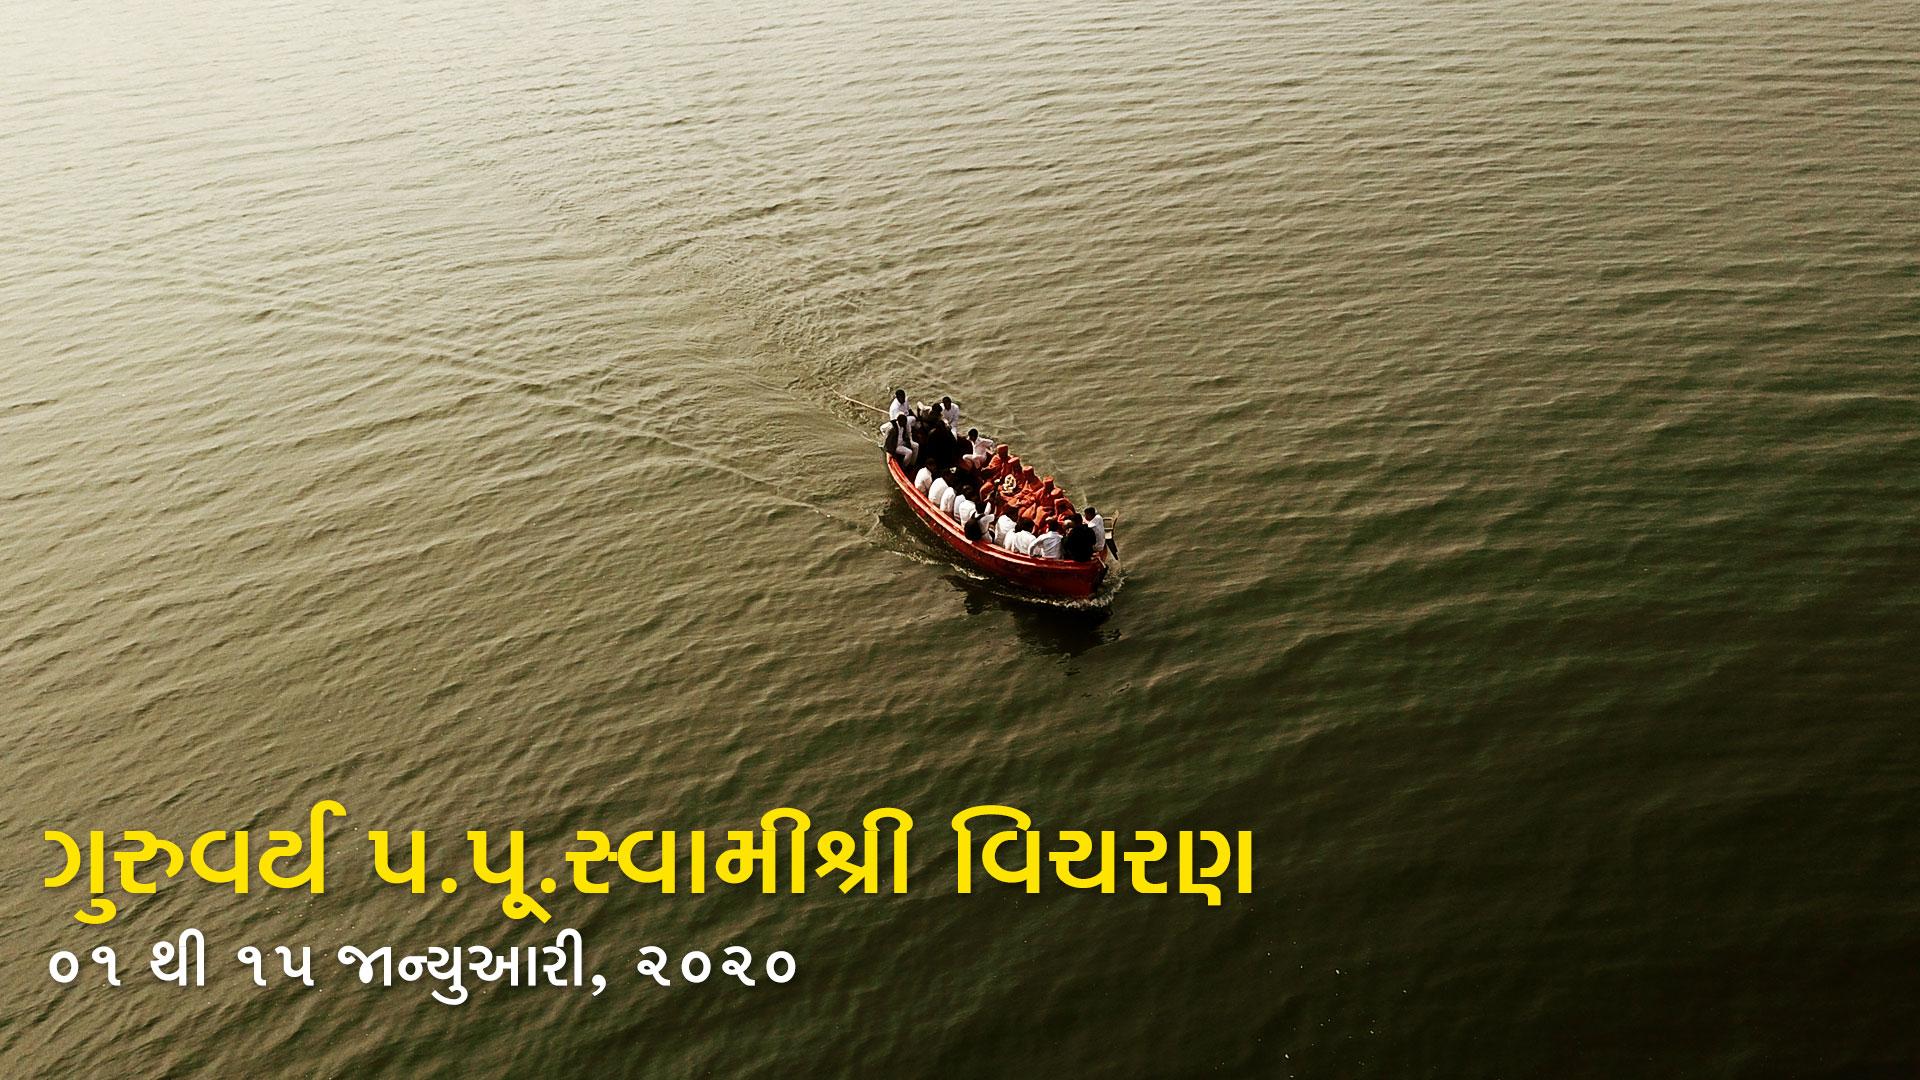 HDH Swamishri Vicharan | 01 to 15 Jan, 2020